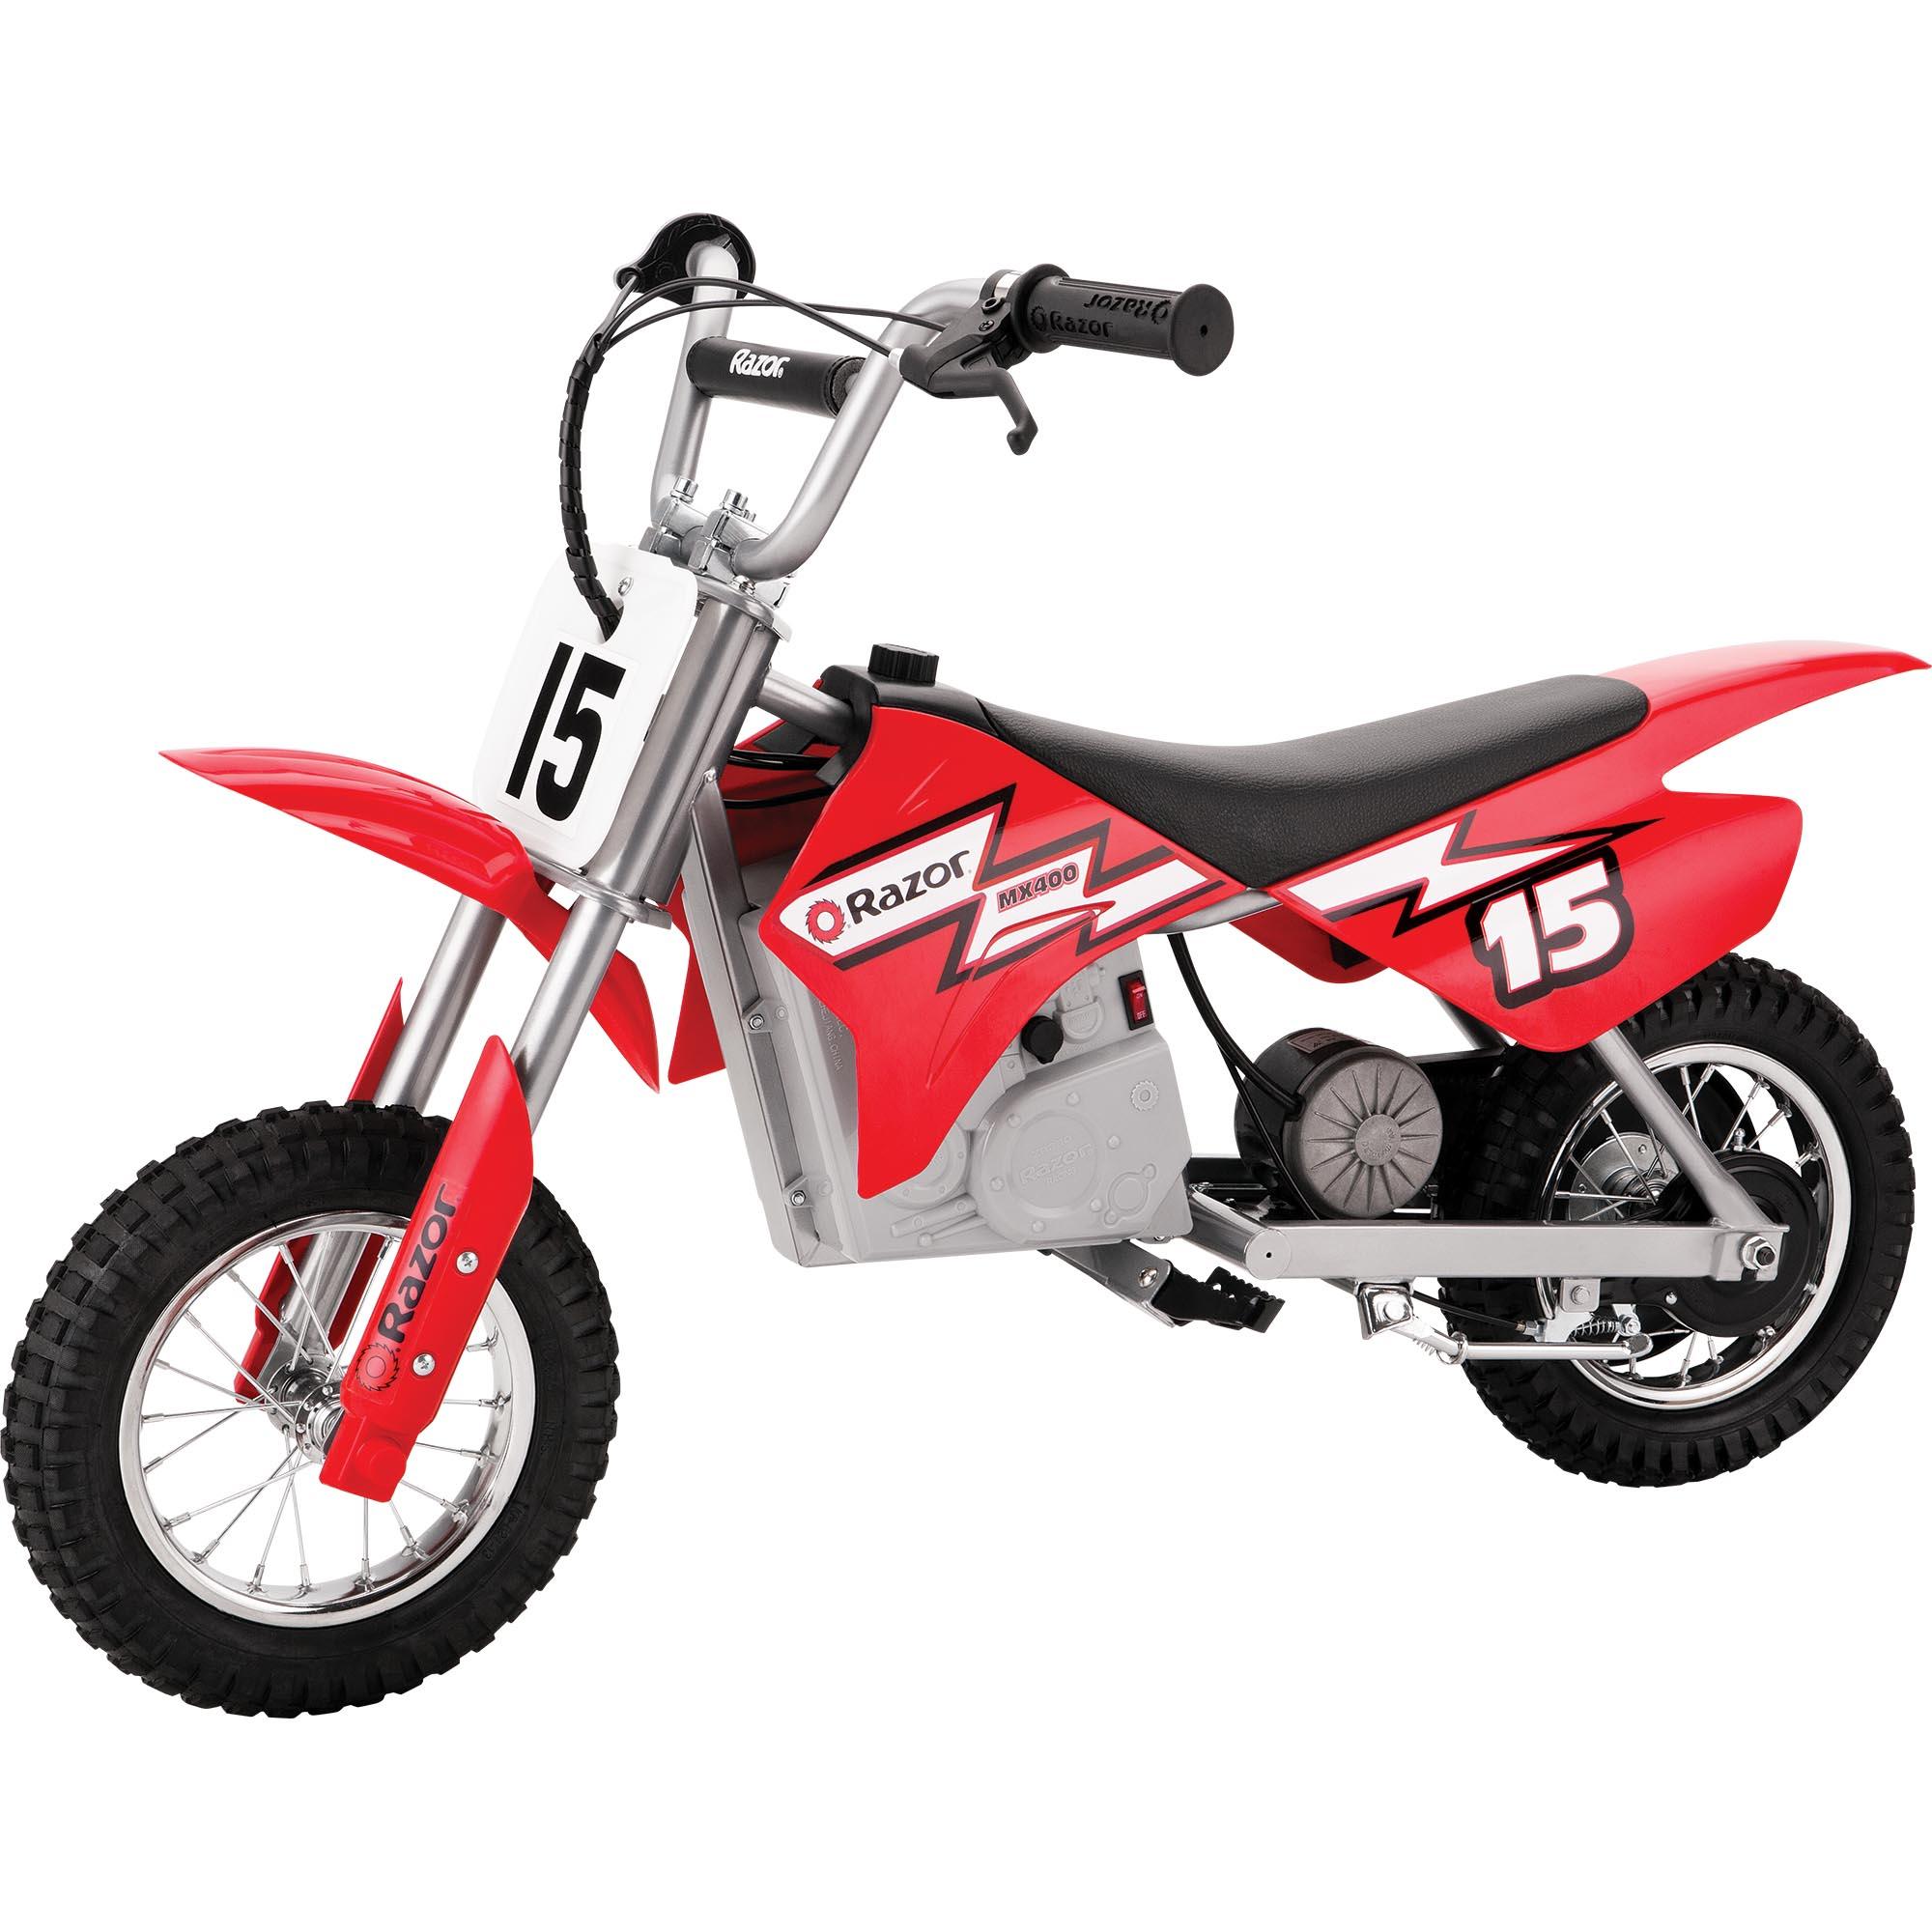 Razor Mx400 Dirt Rocket Dirt Bike Parts Razor Atv Amp Dirt